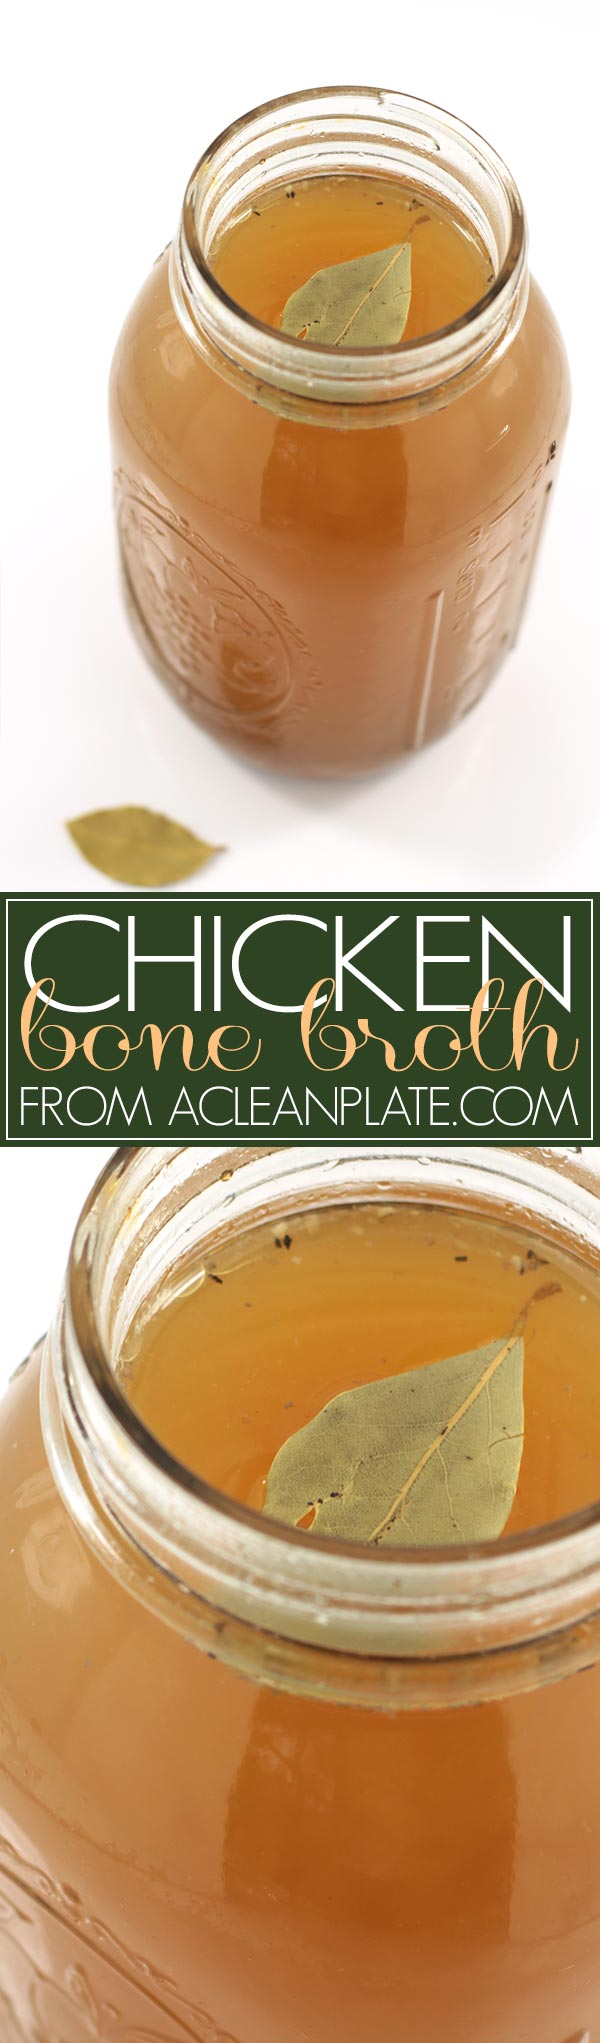 Chicken Bone Broth recipe from acleanplate.com